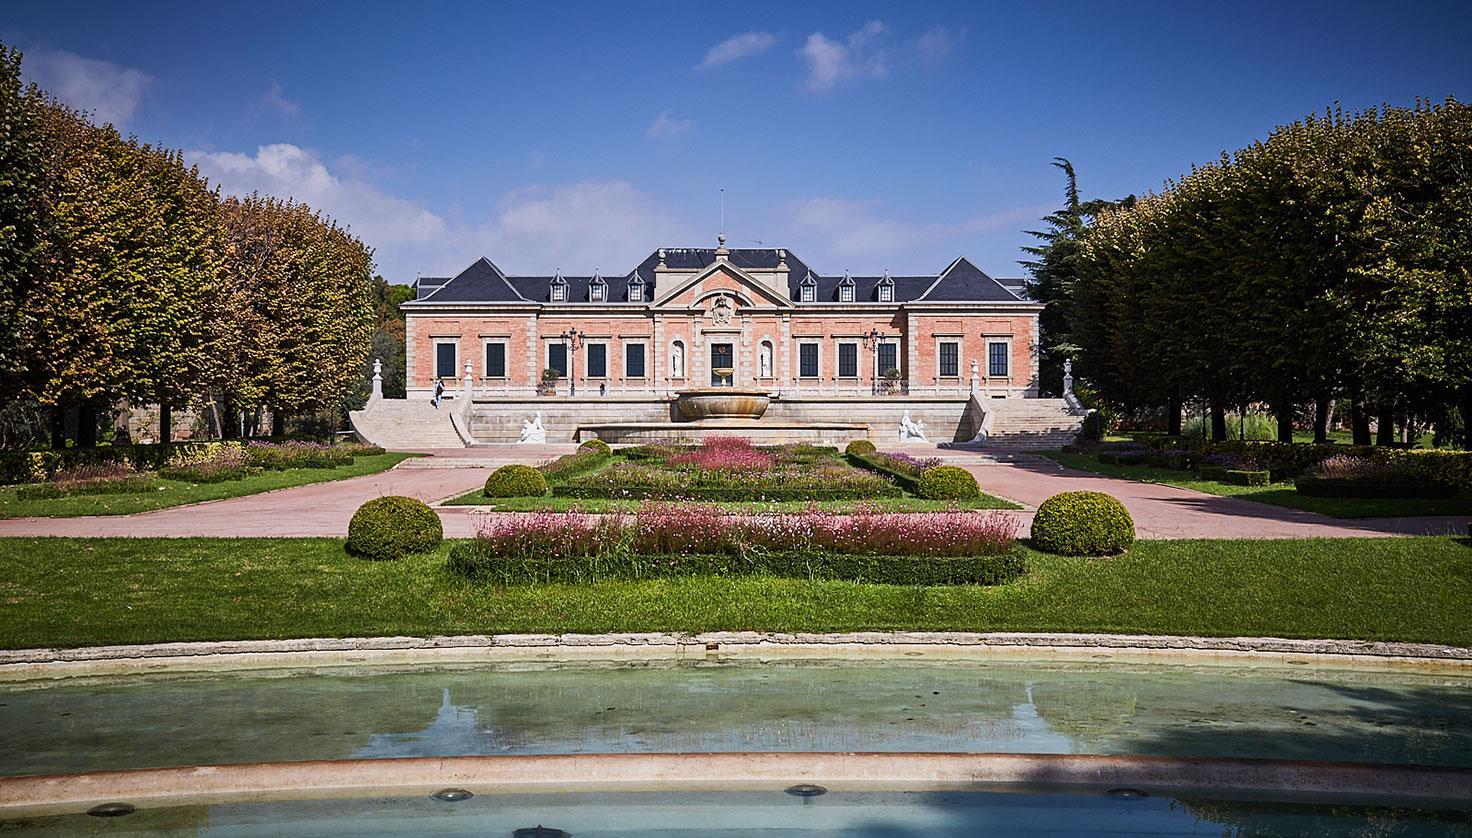 Foto Palauet Albèniz - Jardins de Joan Maragall